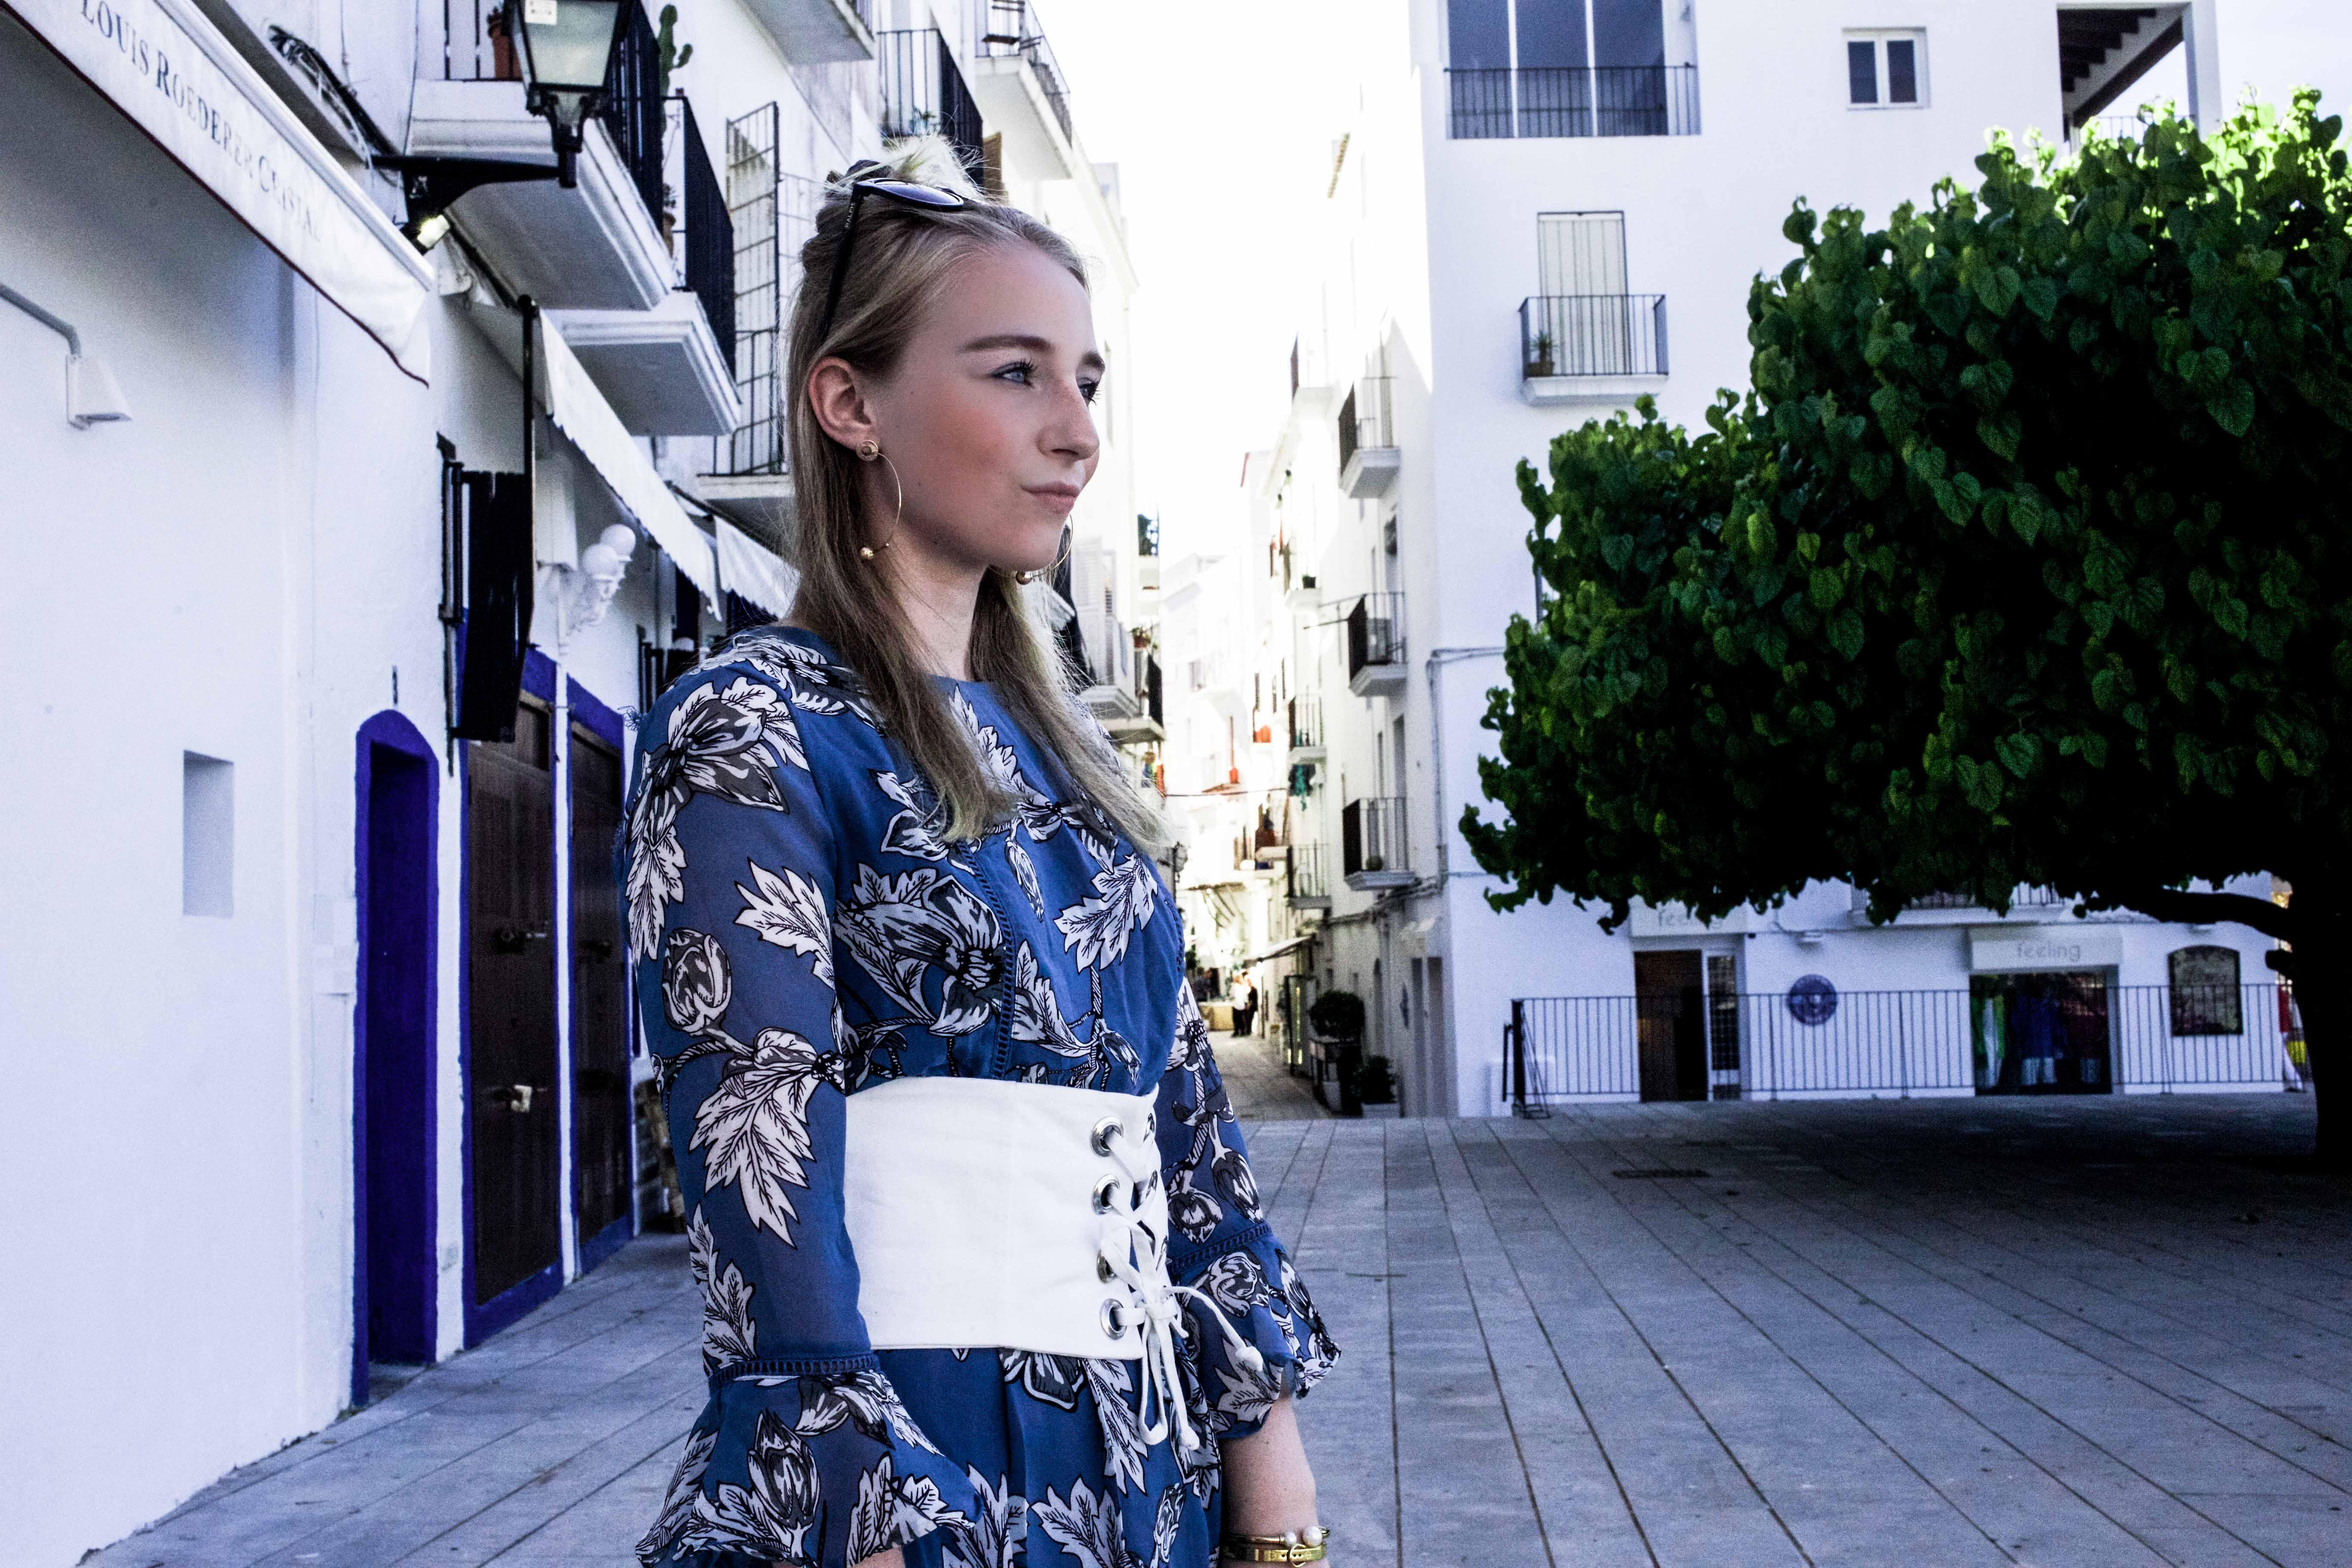 trend-report-taillengürtel-espadrilles-sommerlook-ibiza-modeblog-fashionblog-fashionvernissage_9561